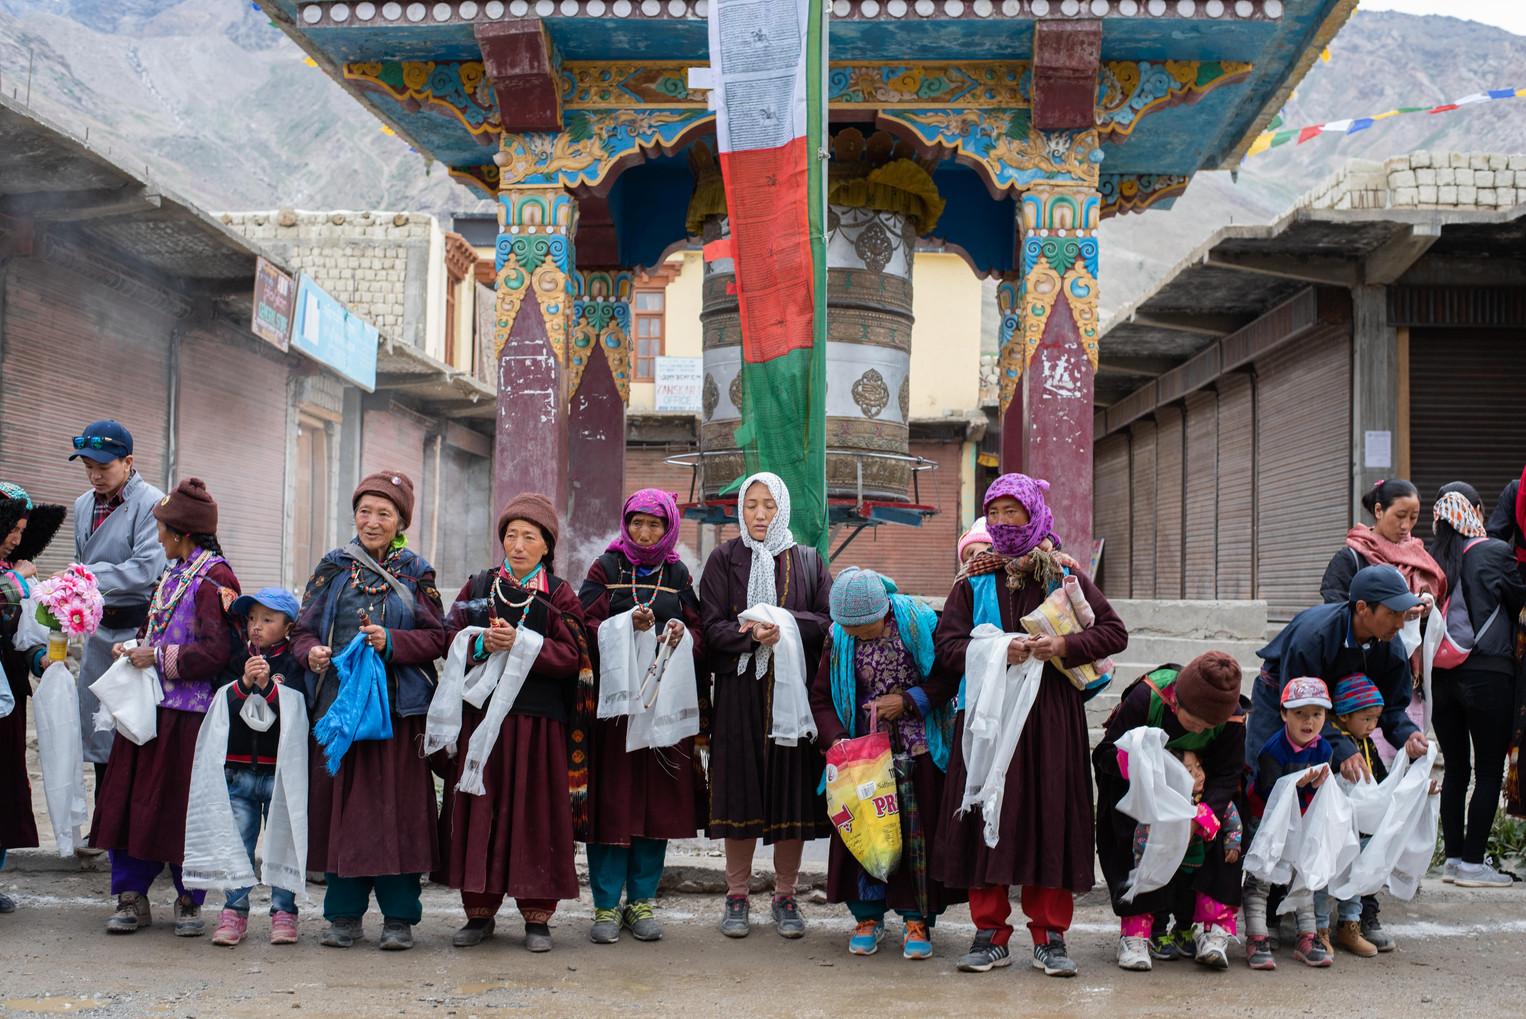 Waiting for His Holiness' arrival - Padum, Zanskar - July 2018